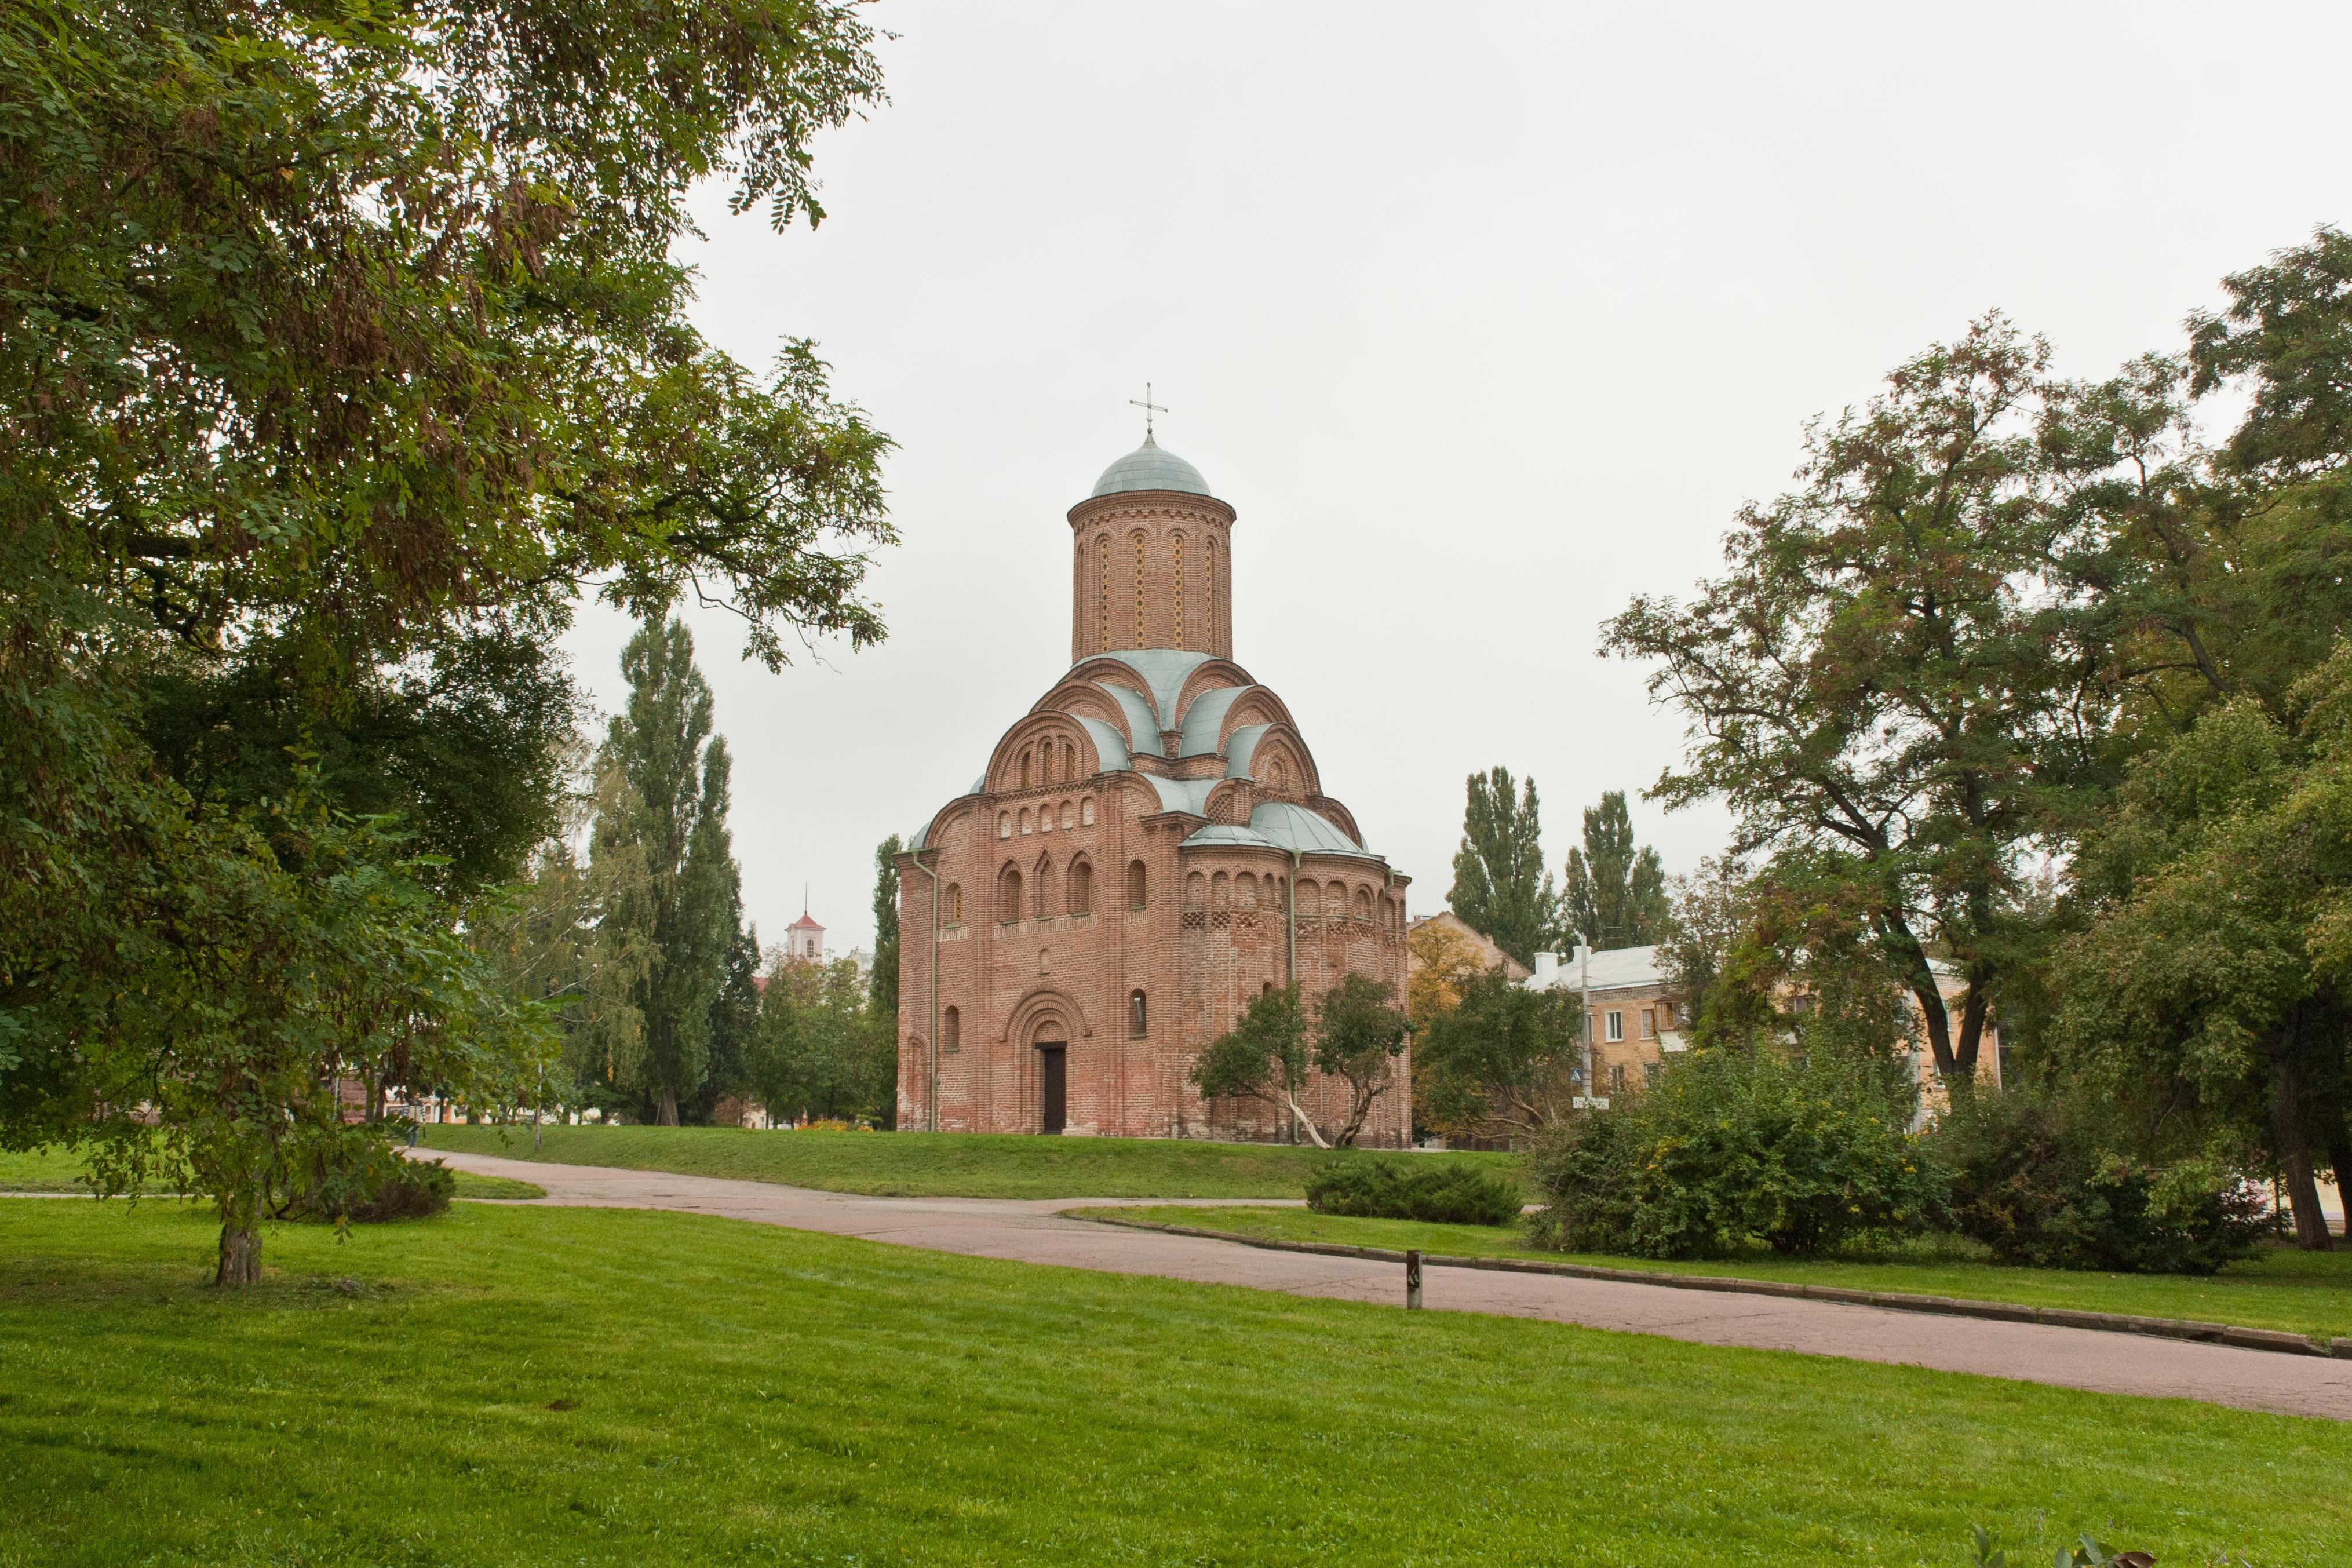 File:П'ятницька церква - Чернігів 5.jpg - Wikimedia Commons